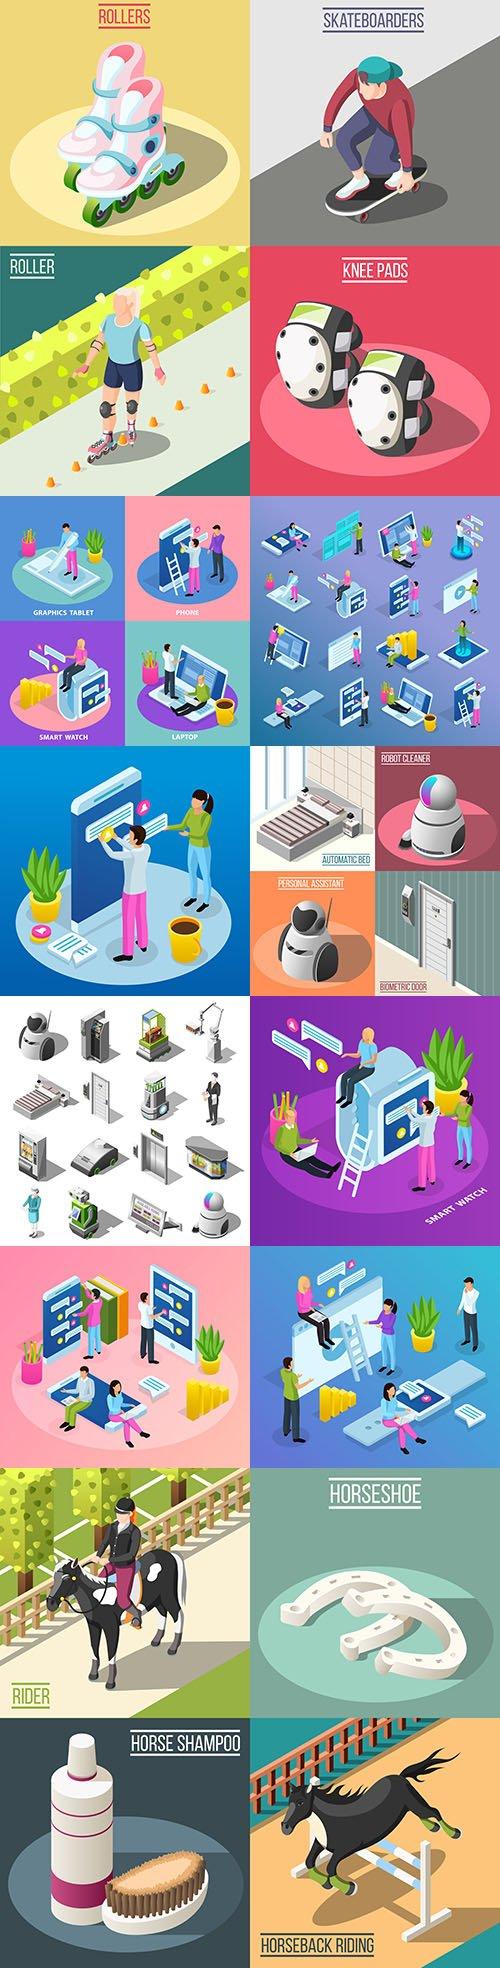 Isometrics flat business technology and people design 14